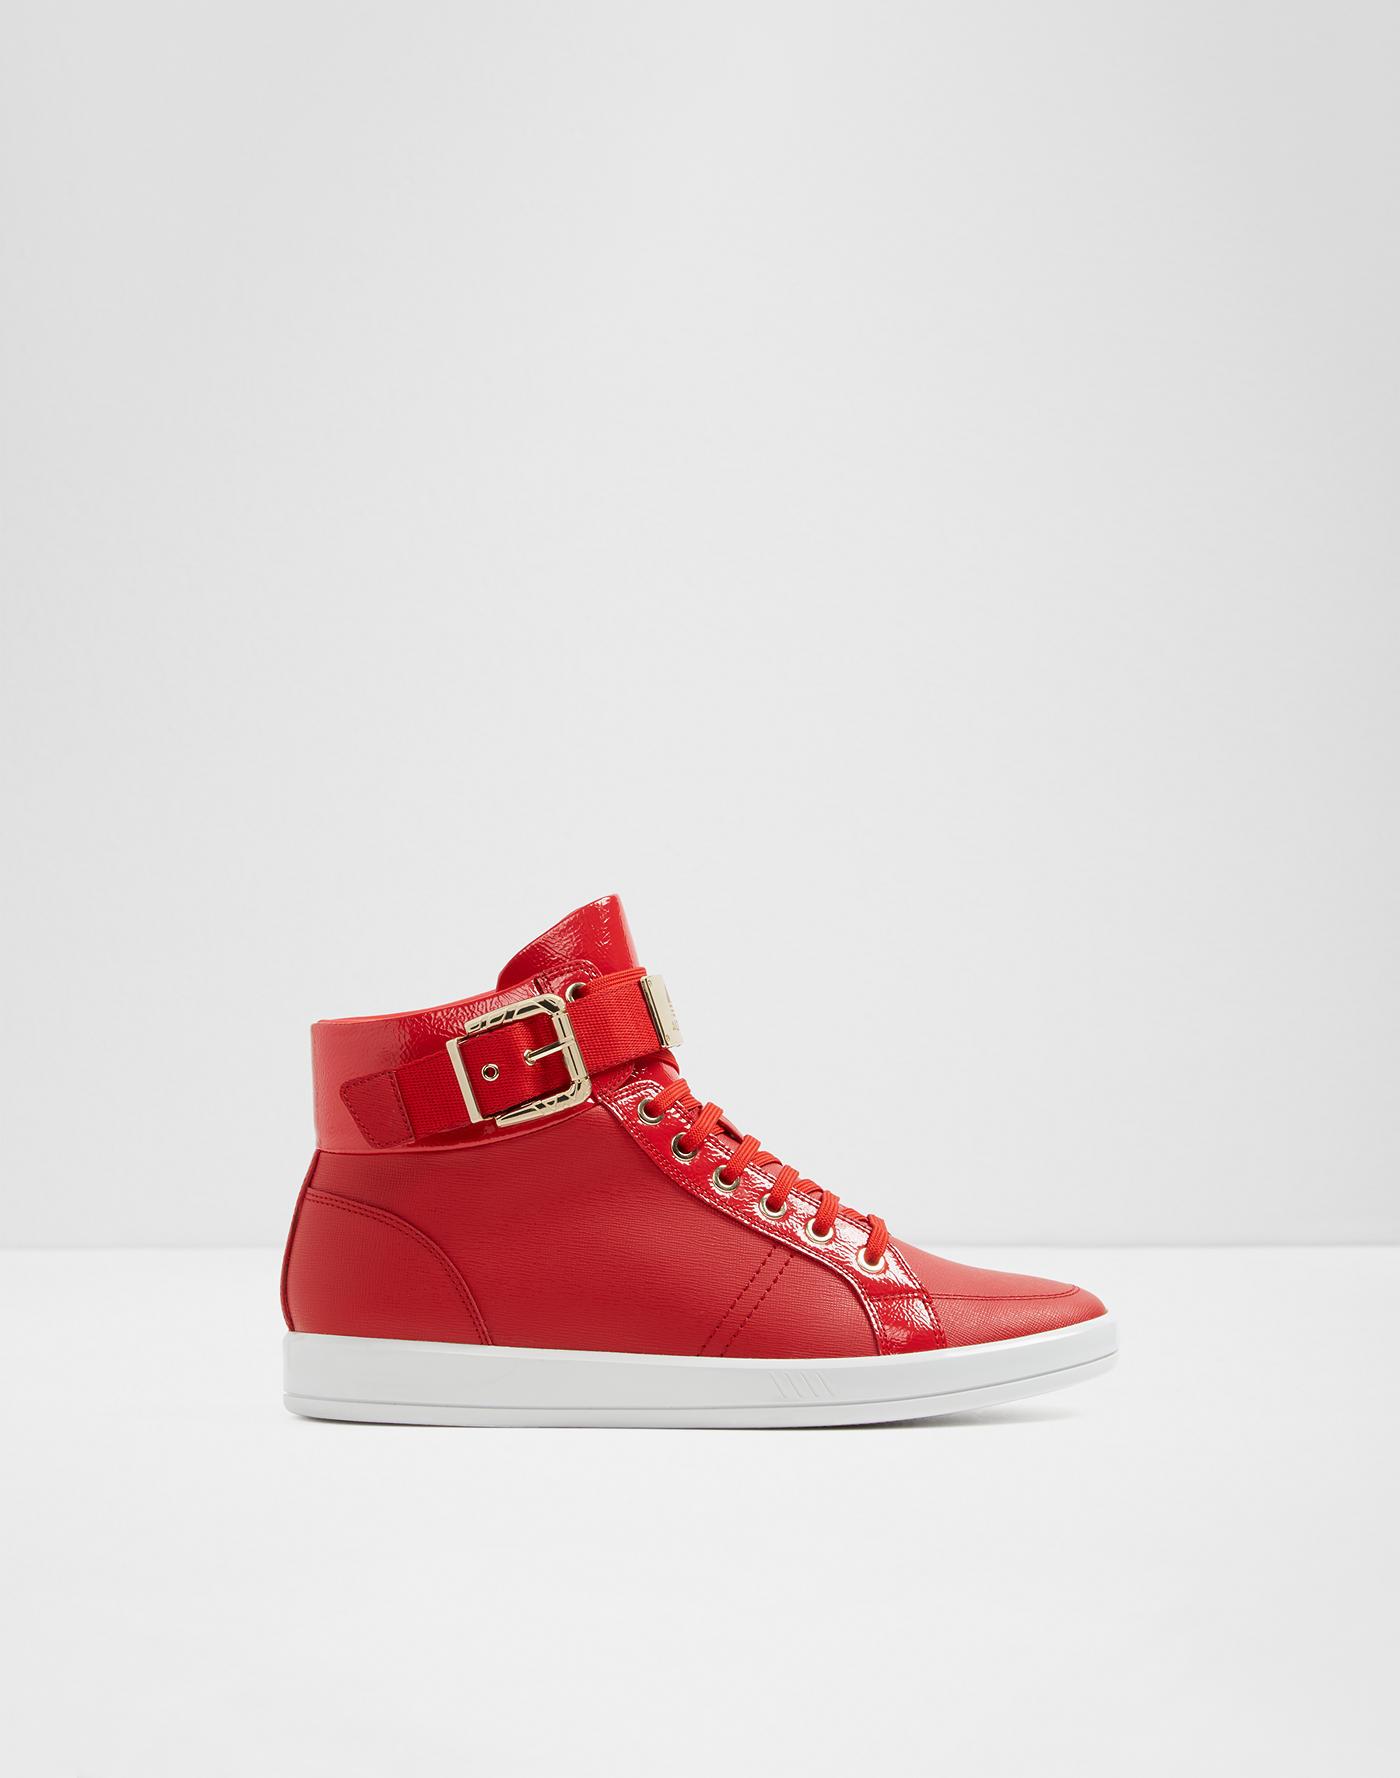 Men S Sneakers Amp Tennis Shoes Fashion Sneakers Aldo Us